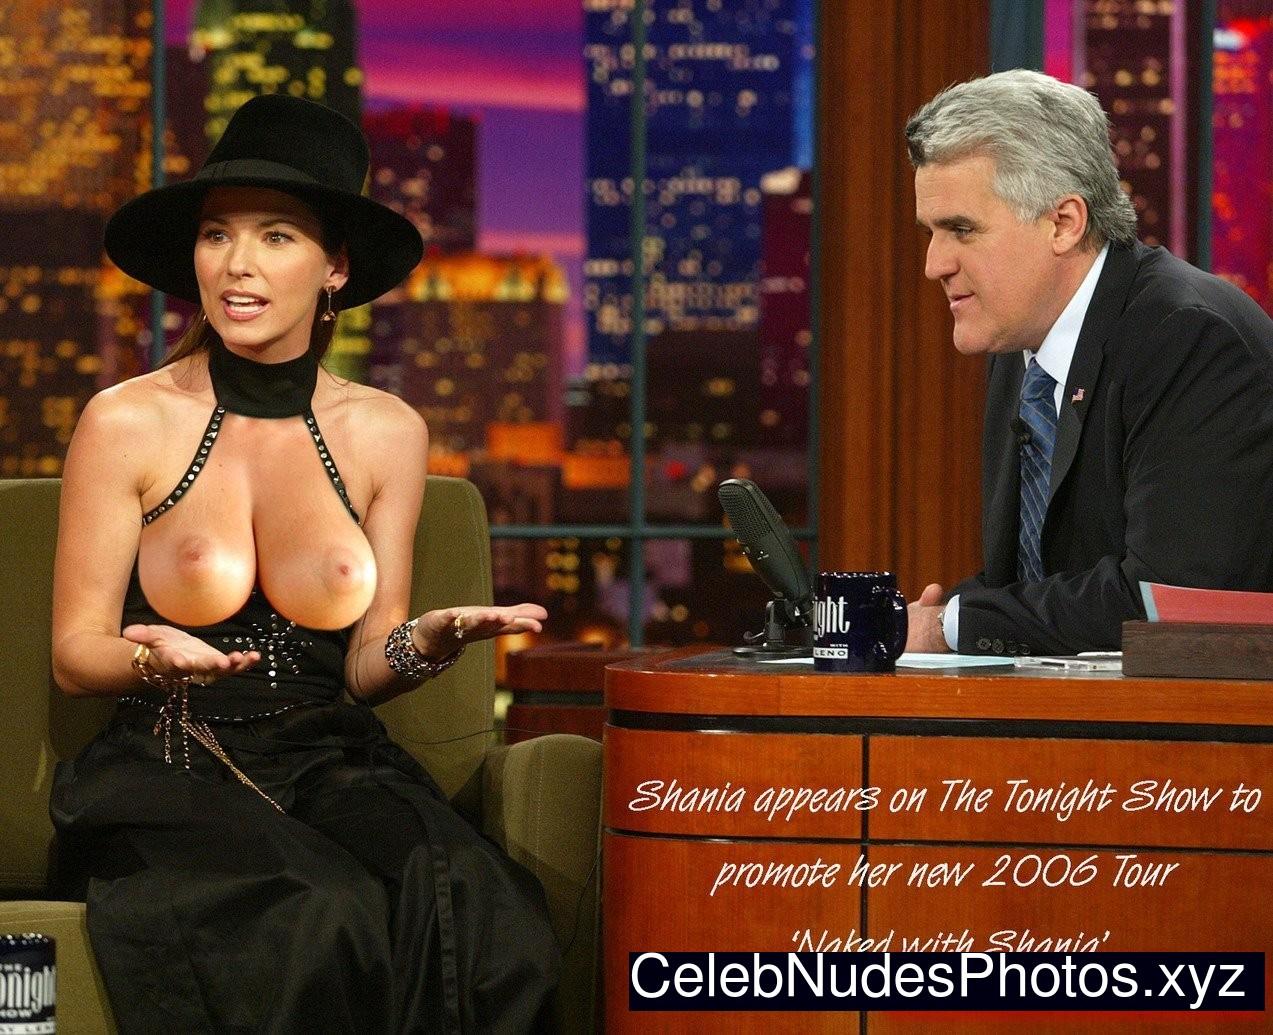 Shania Twain free nude celebrities